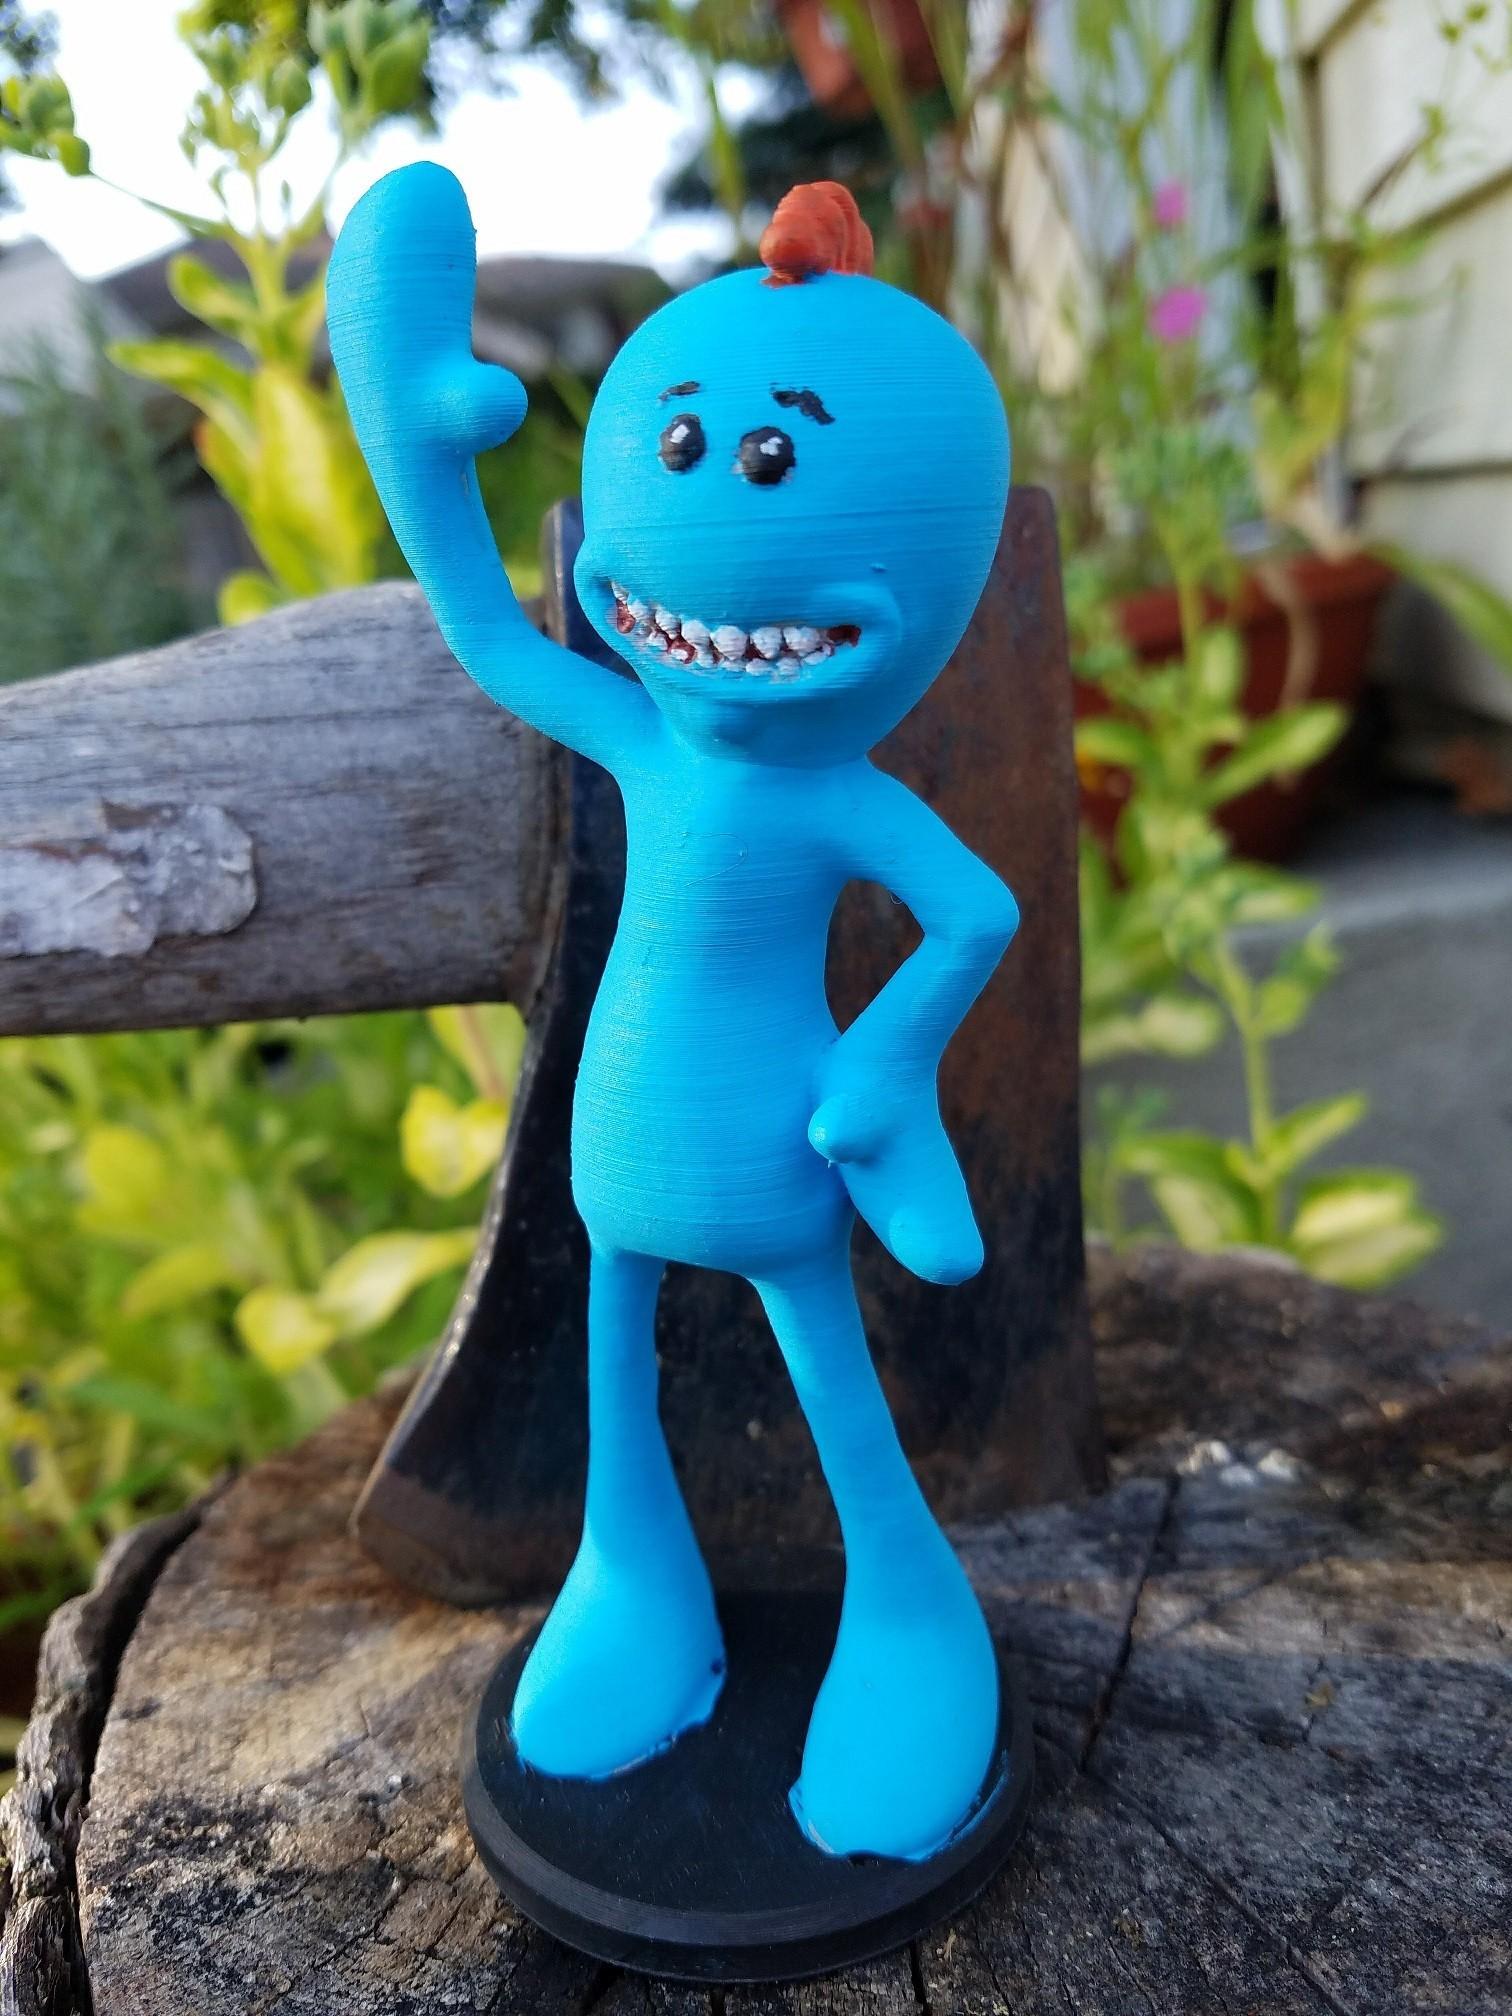 20170815_183248.jpg Download free STL file Rick and Morty assortment of Mr. Meeseeks • 3D printable model, Anthrobones